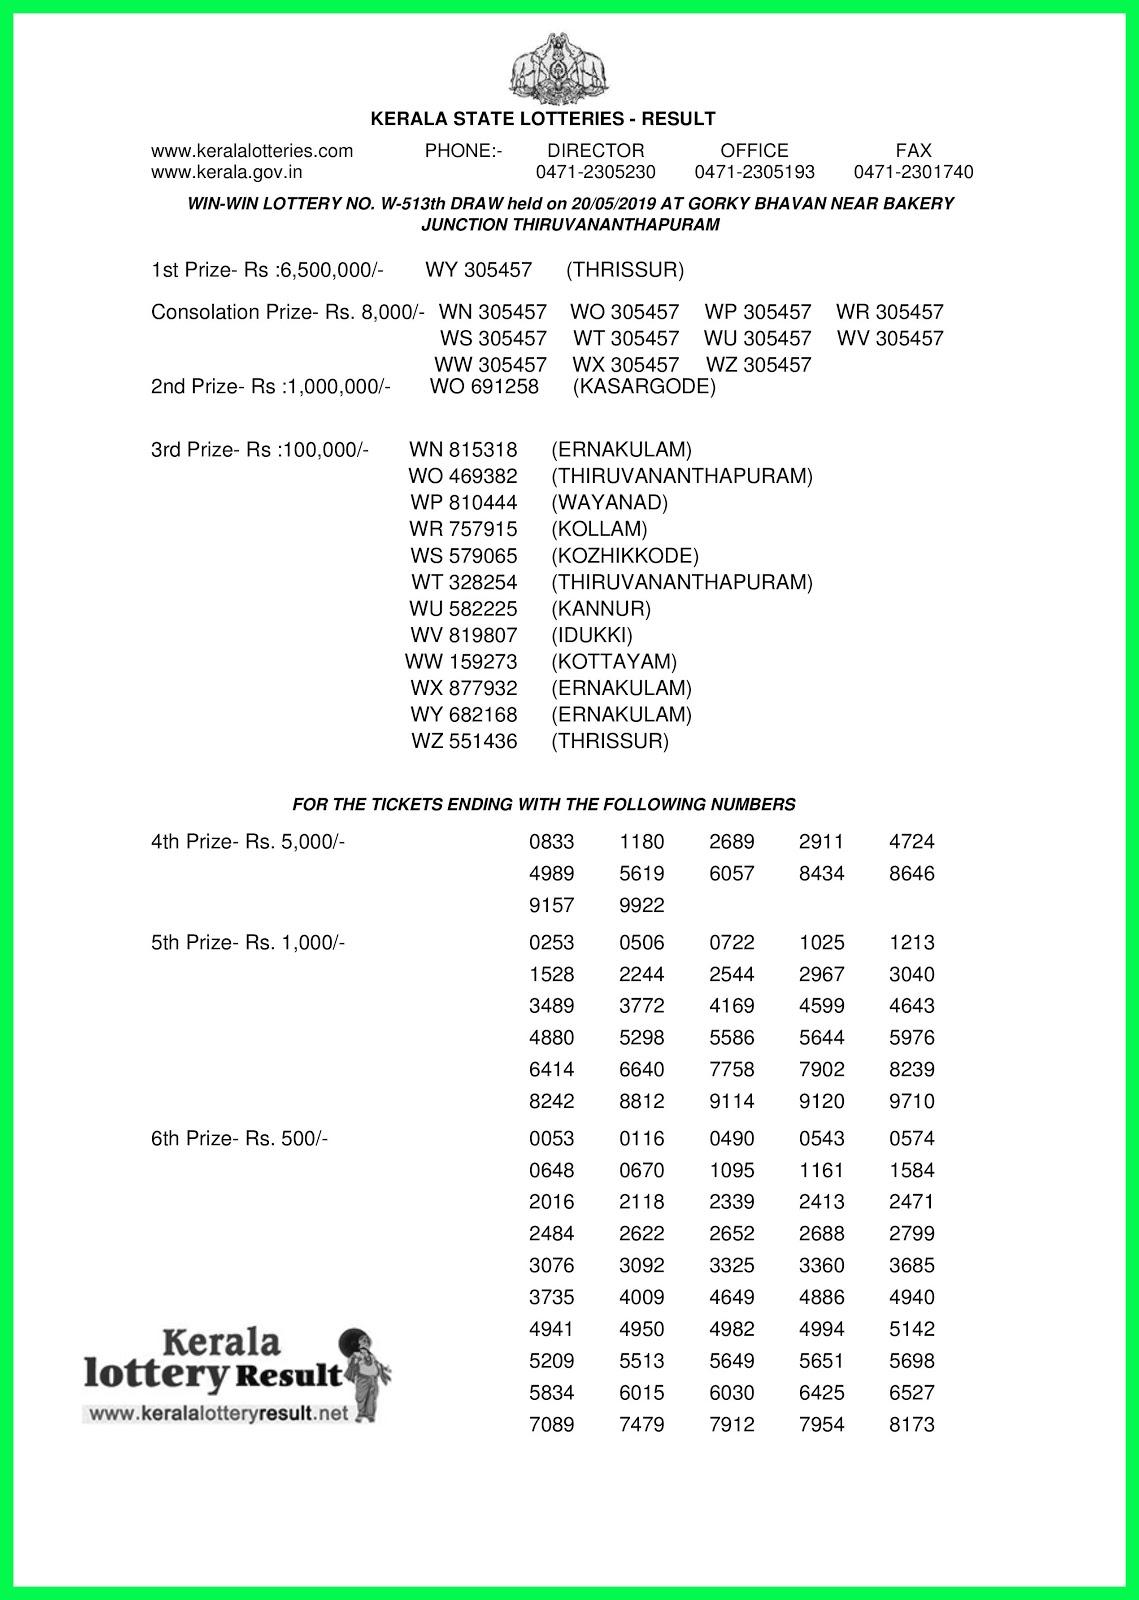 Kerala Lottery Result 20/05/2019